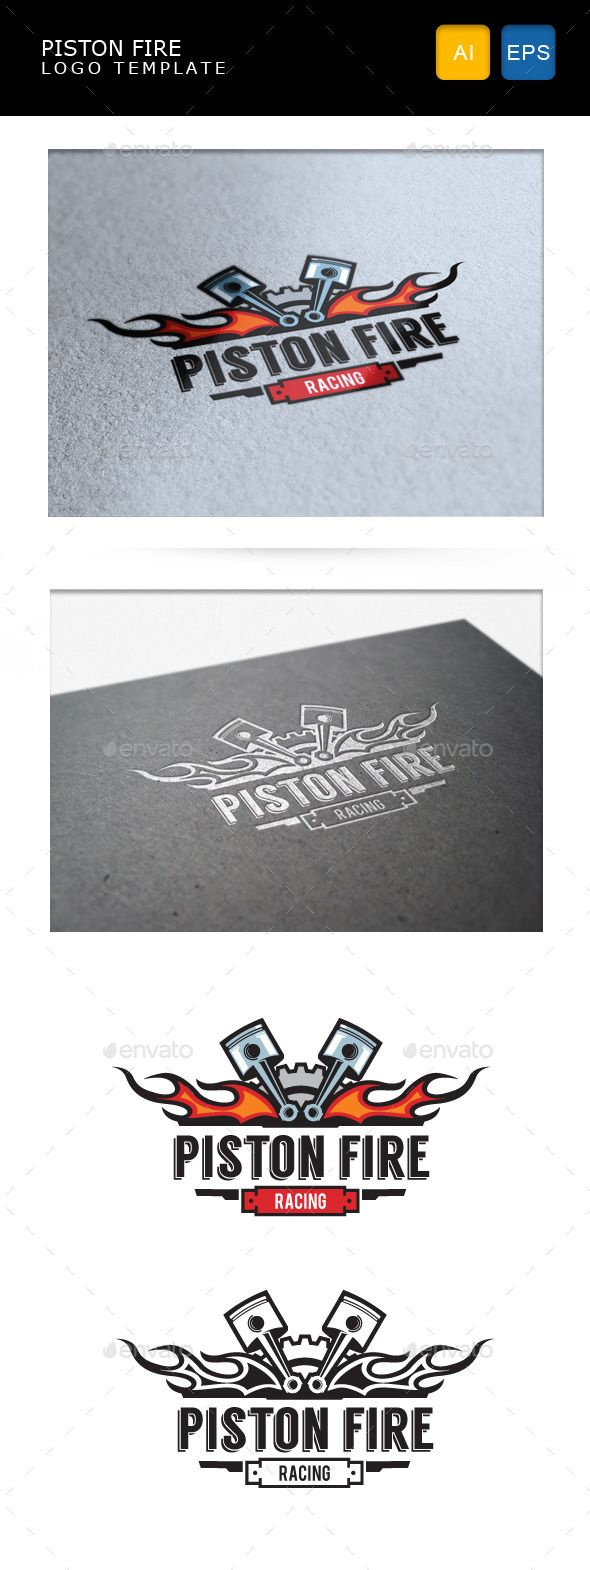 Car body sticker design eps - Piston Fire Automotive Logoautomotive Designlogo